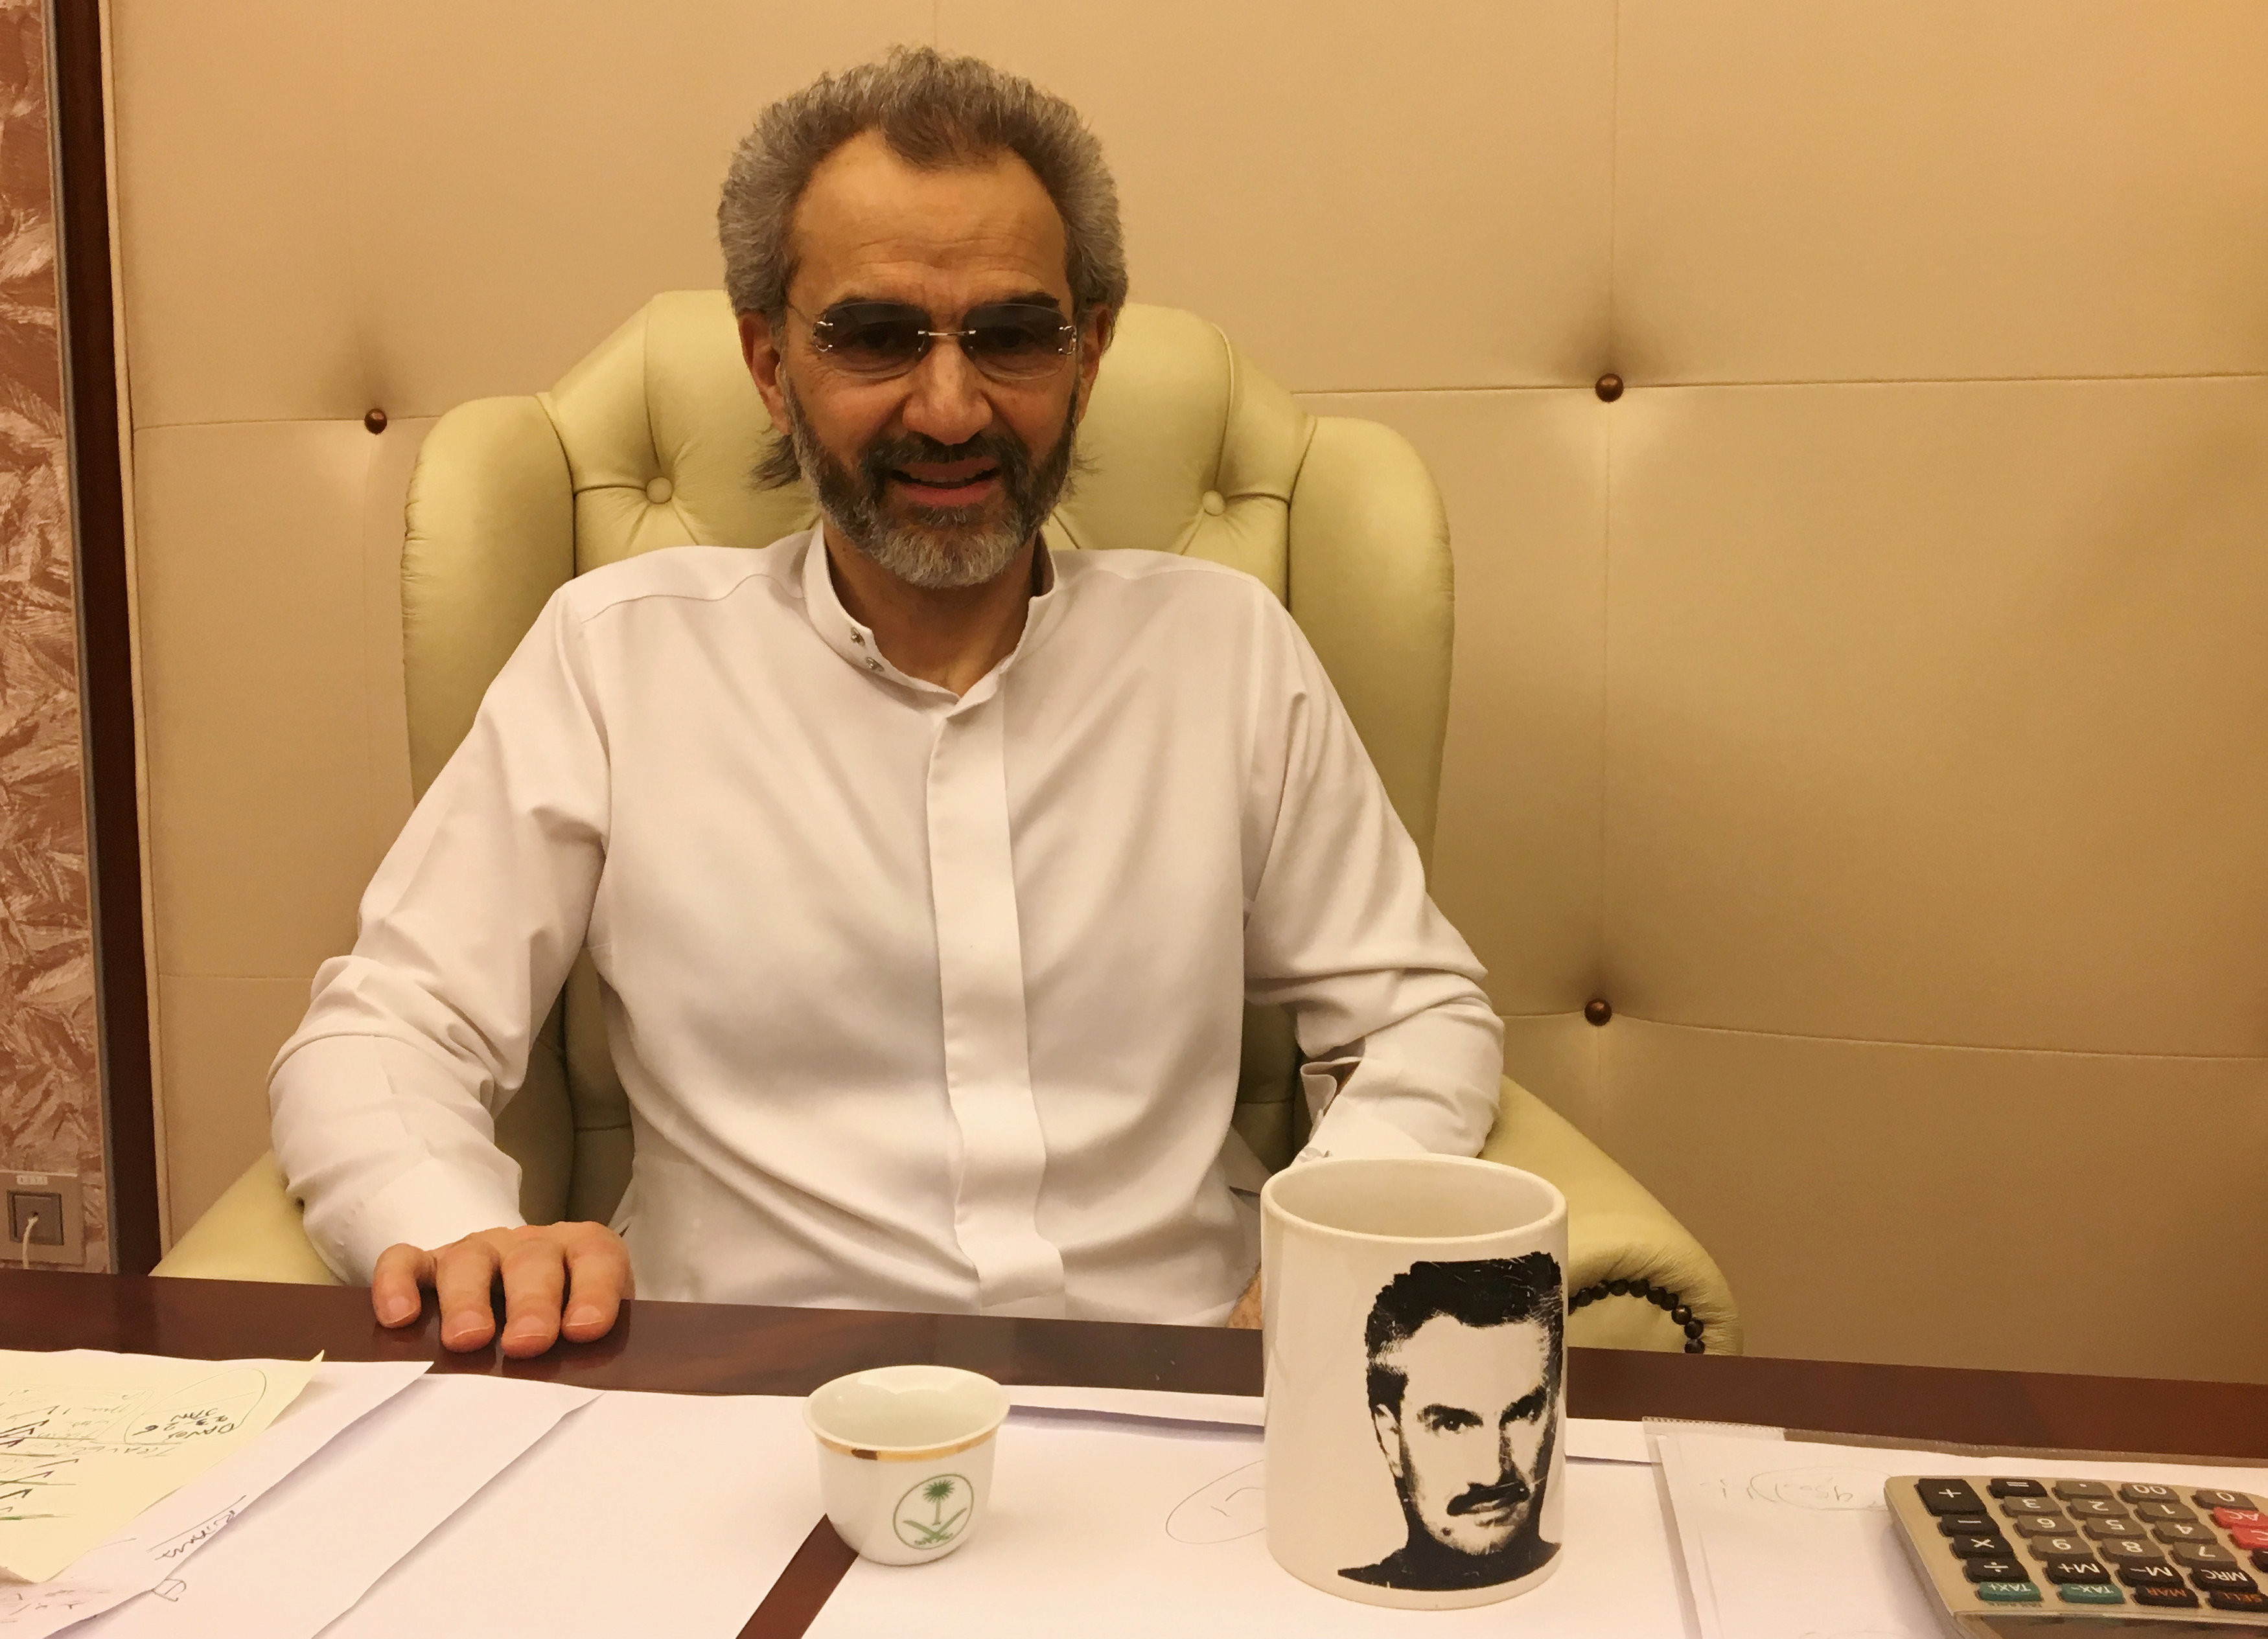 <p><span>Принц Саудовской Аравии, миллиардер Аль-Валид ибн Талал.&nbsp;</span>Фото: &copy;REUTERS/Katie Paul</p>